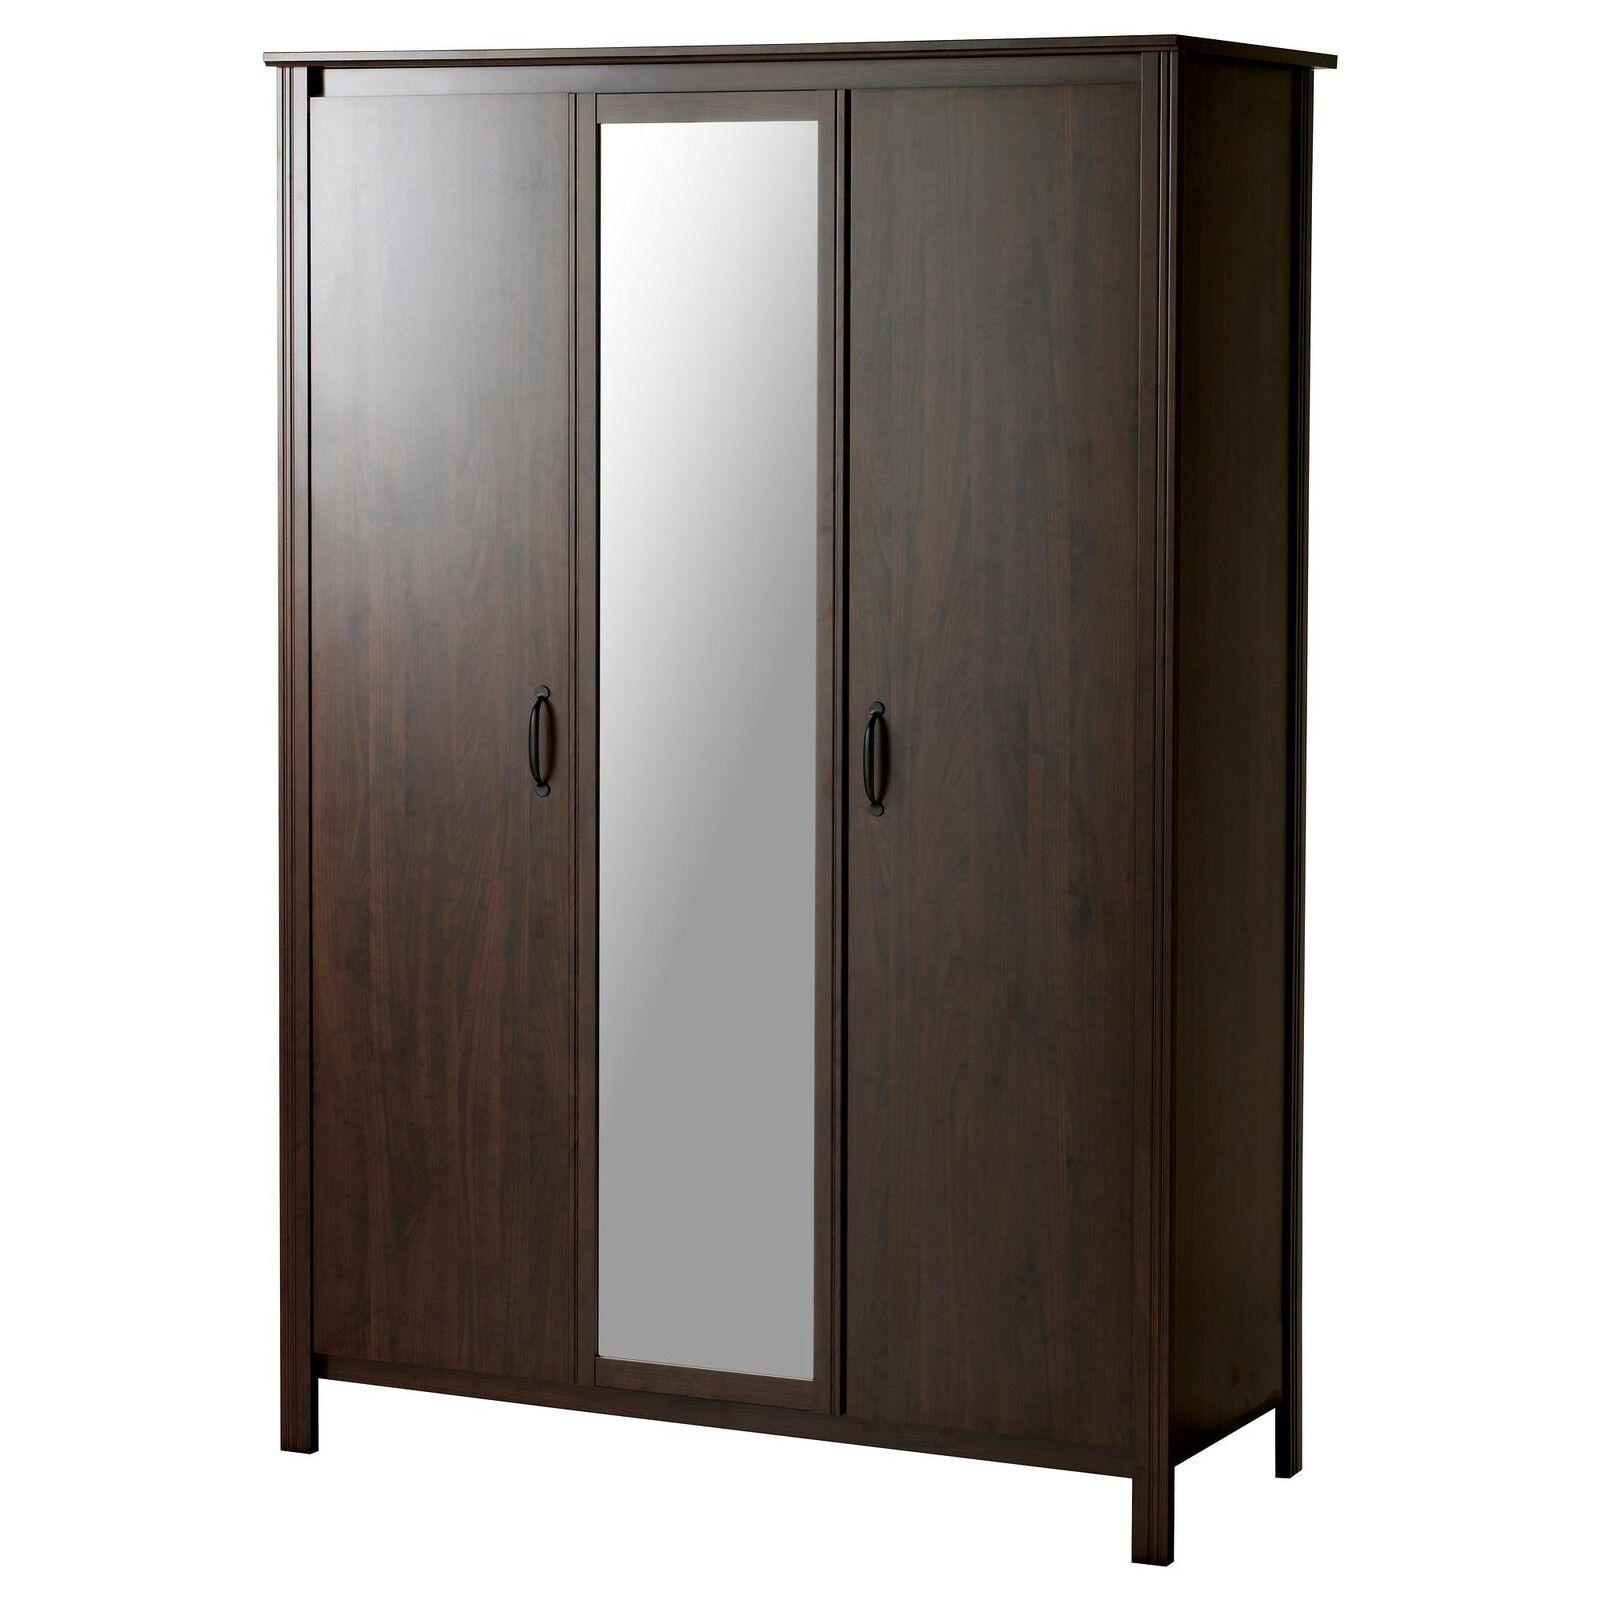 IKEA Wardrobe